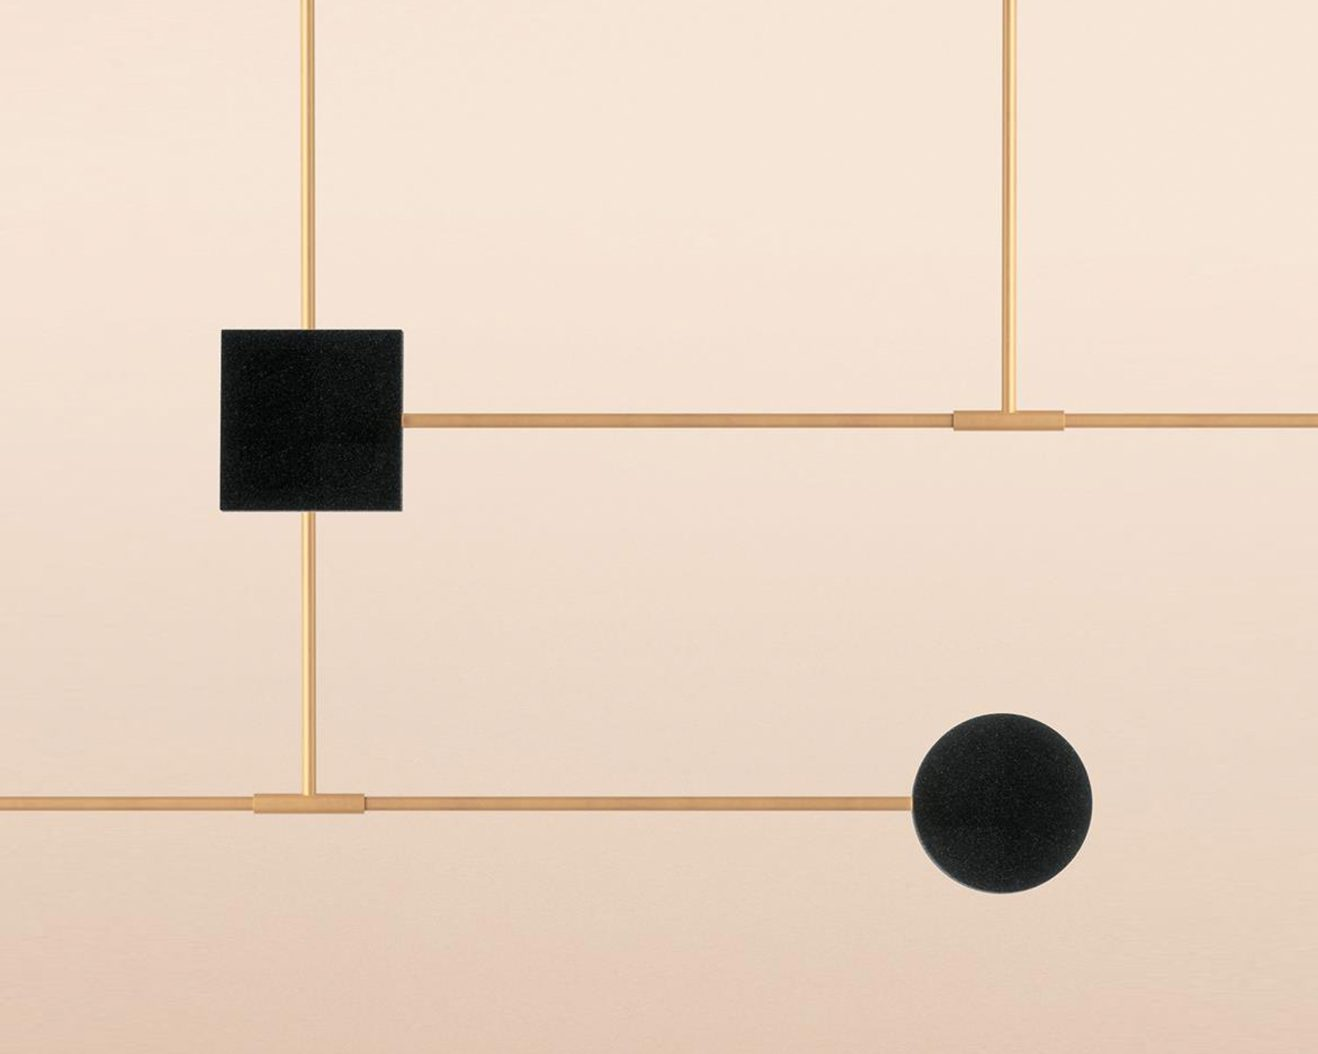 Wishnya-Suspension-Libra-Disc-Brass-Ambiance-Savannah-Bay-Gallery